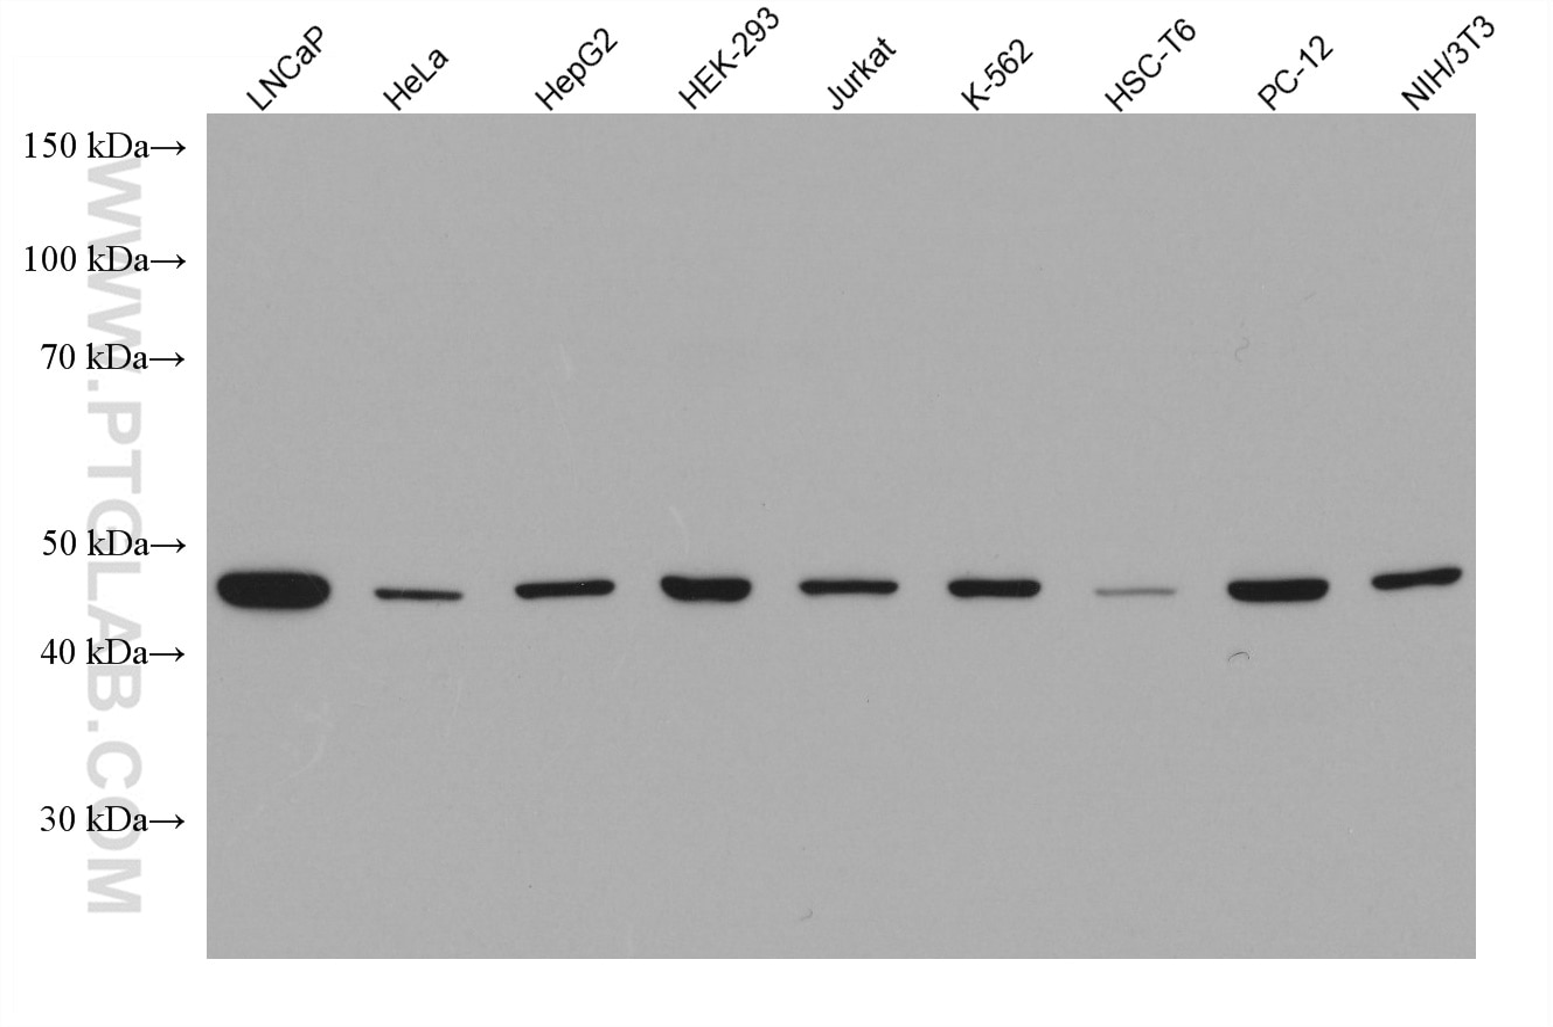 WB analysis of LNCaP using 67784-1-Ig